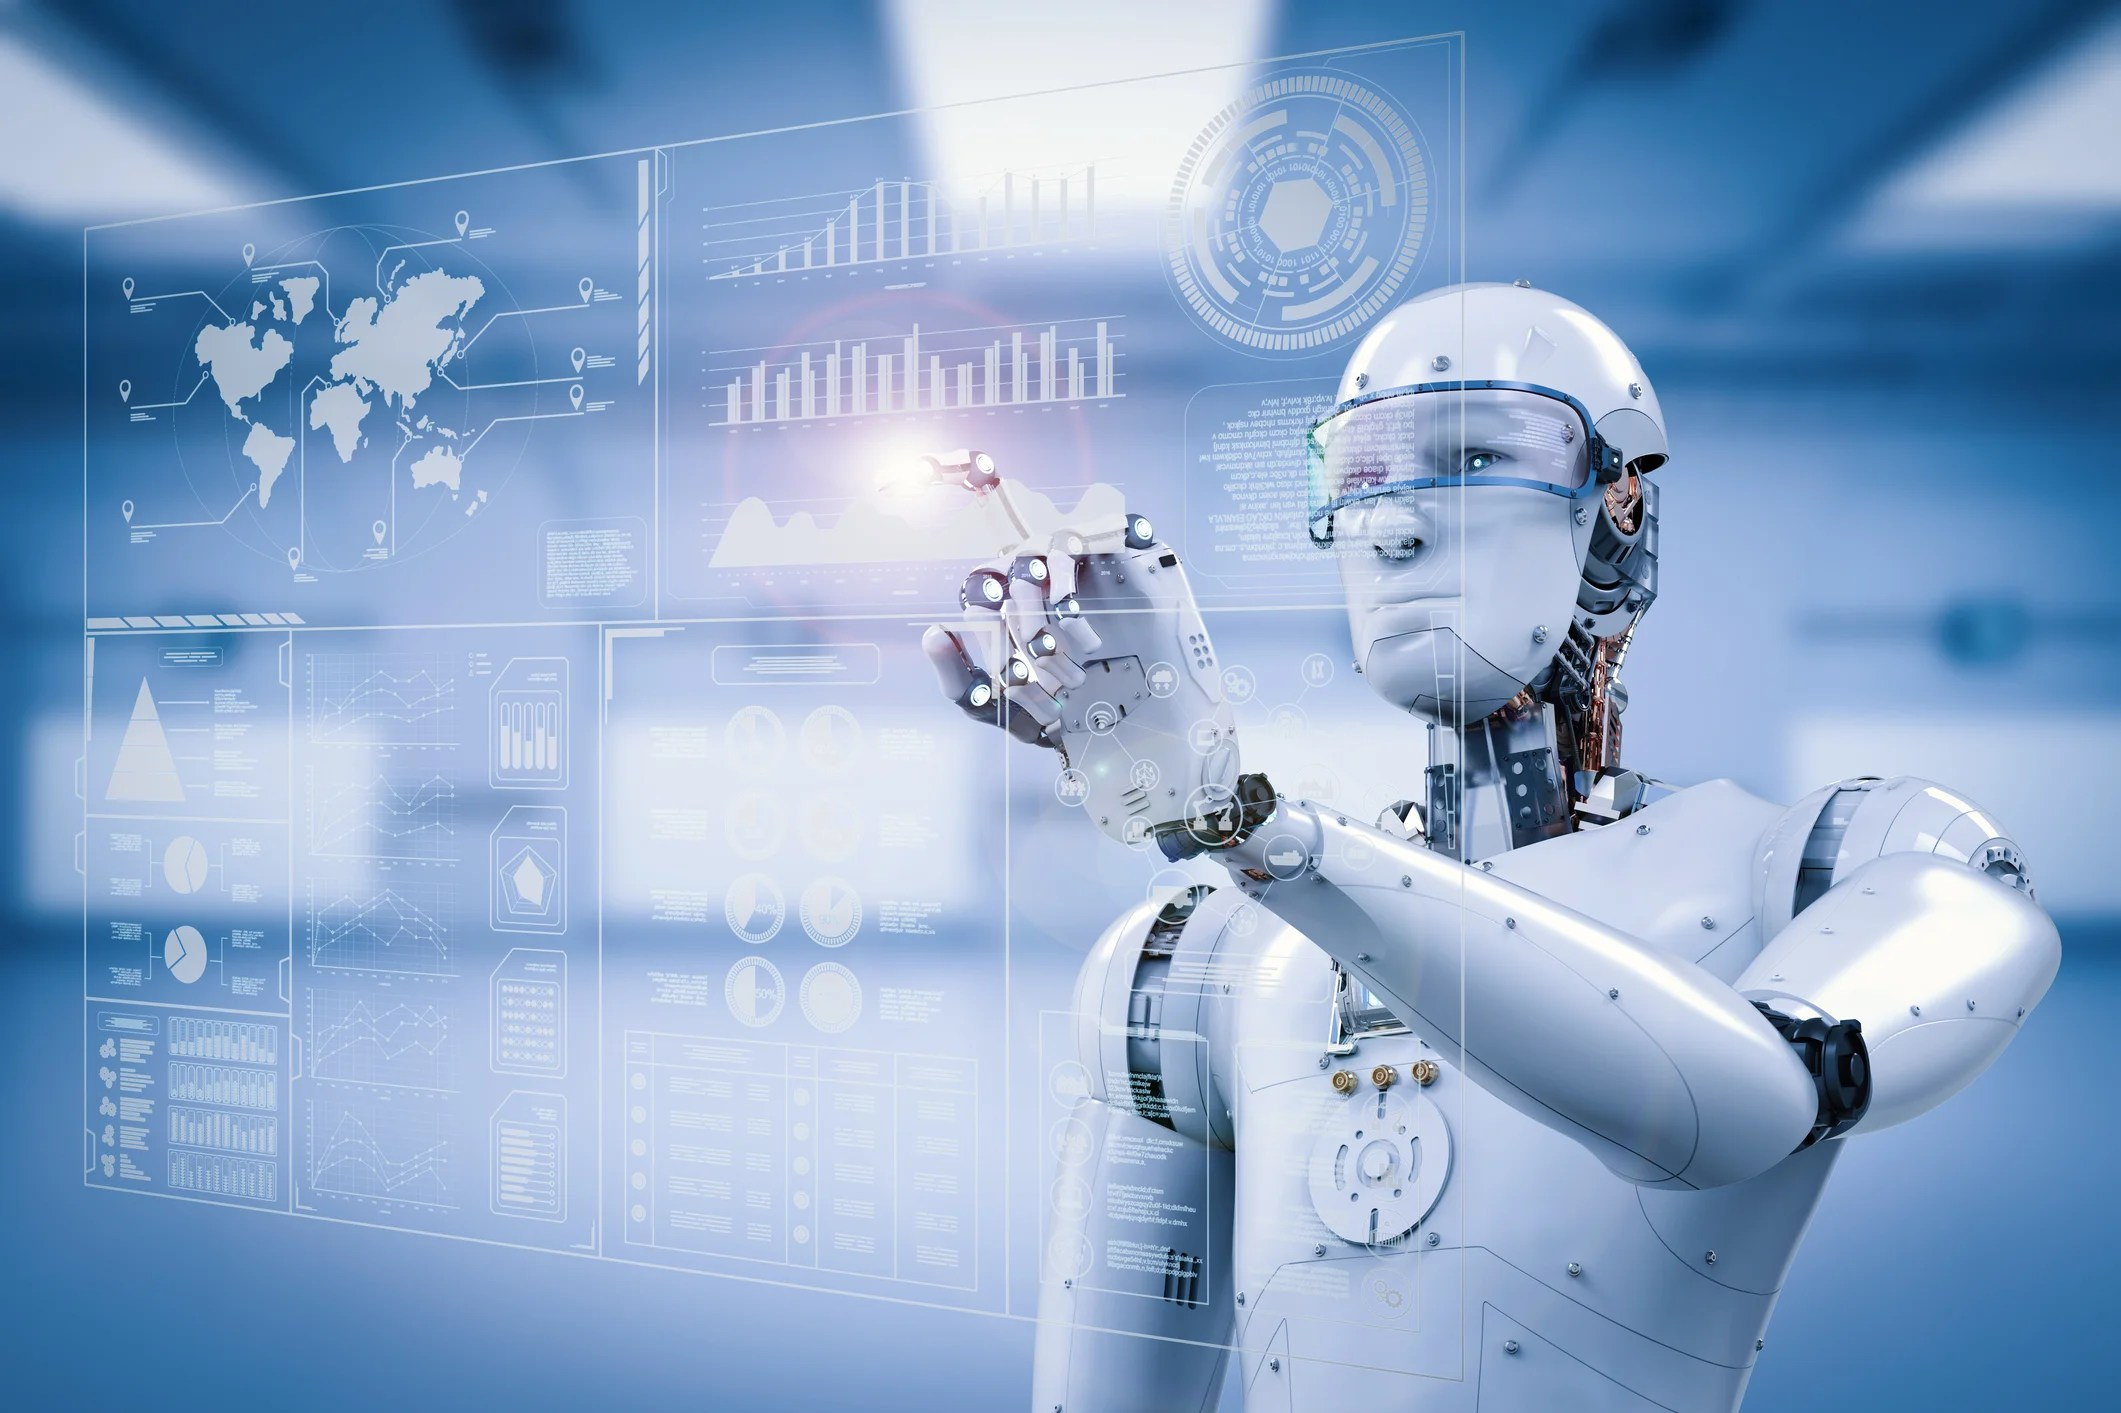 3 robotics stocks to